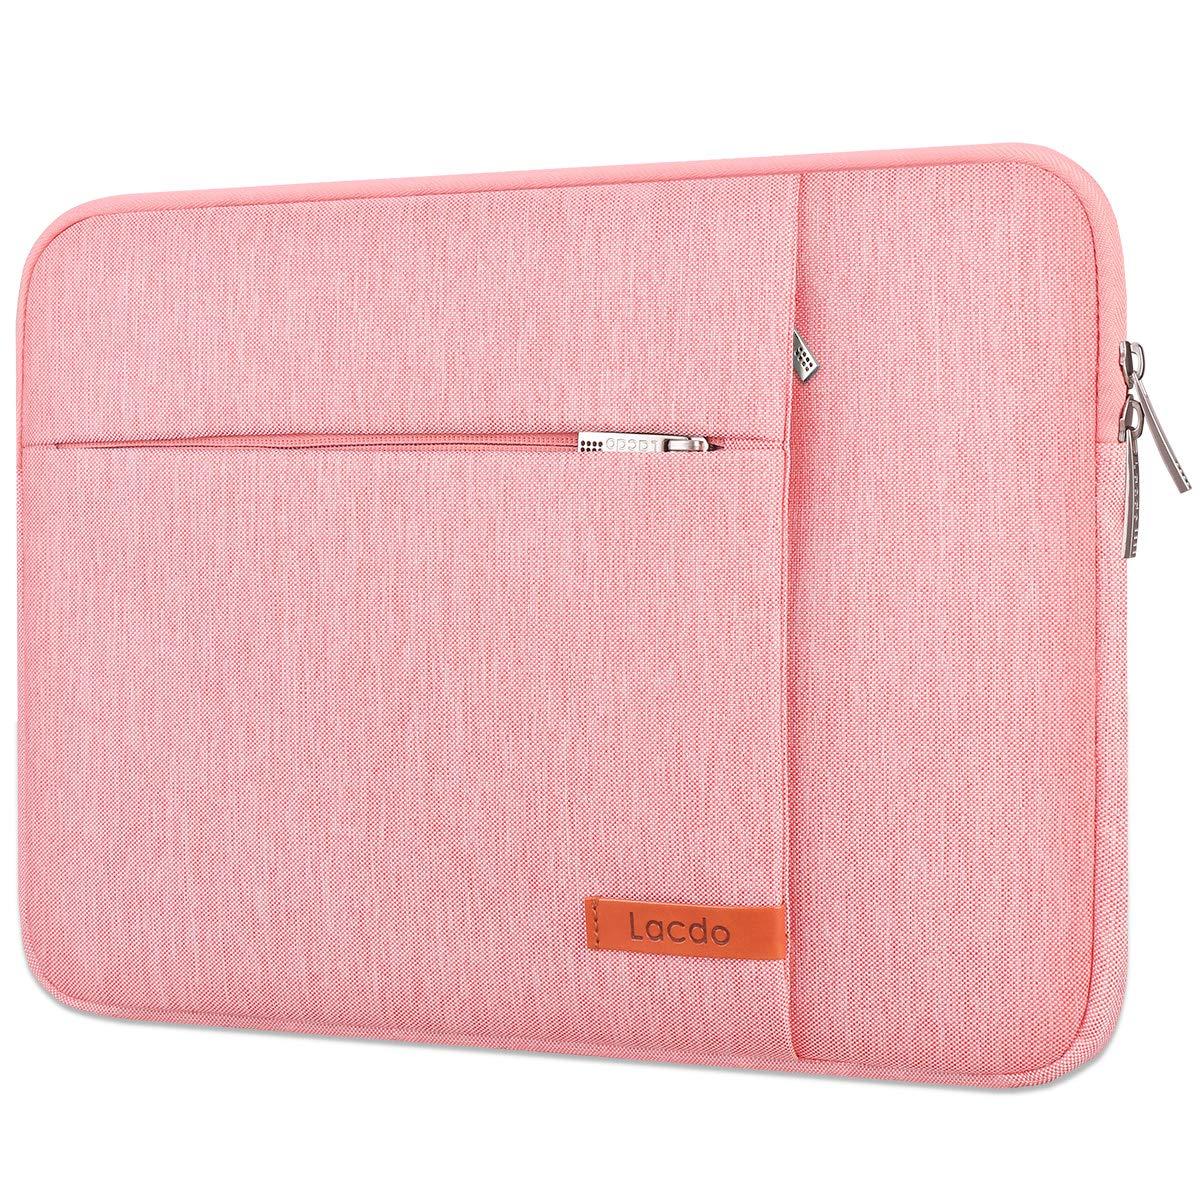 "Lacdo 15.6 Inch Laptop Sleeve Case Computer Bag for 15.6"" Acer Aspire/Predator, Inspiron, ASUS ZenBook Pro 15 VivoBook, HP Pavilion, Lenovo IdeaPad 330, ThinkPad E590, Chromebook Water Resistant, Pink"